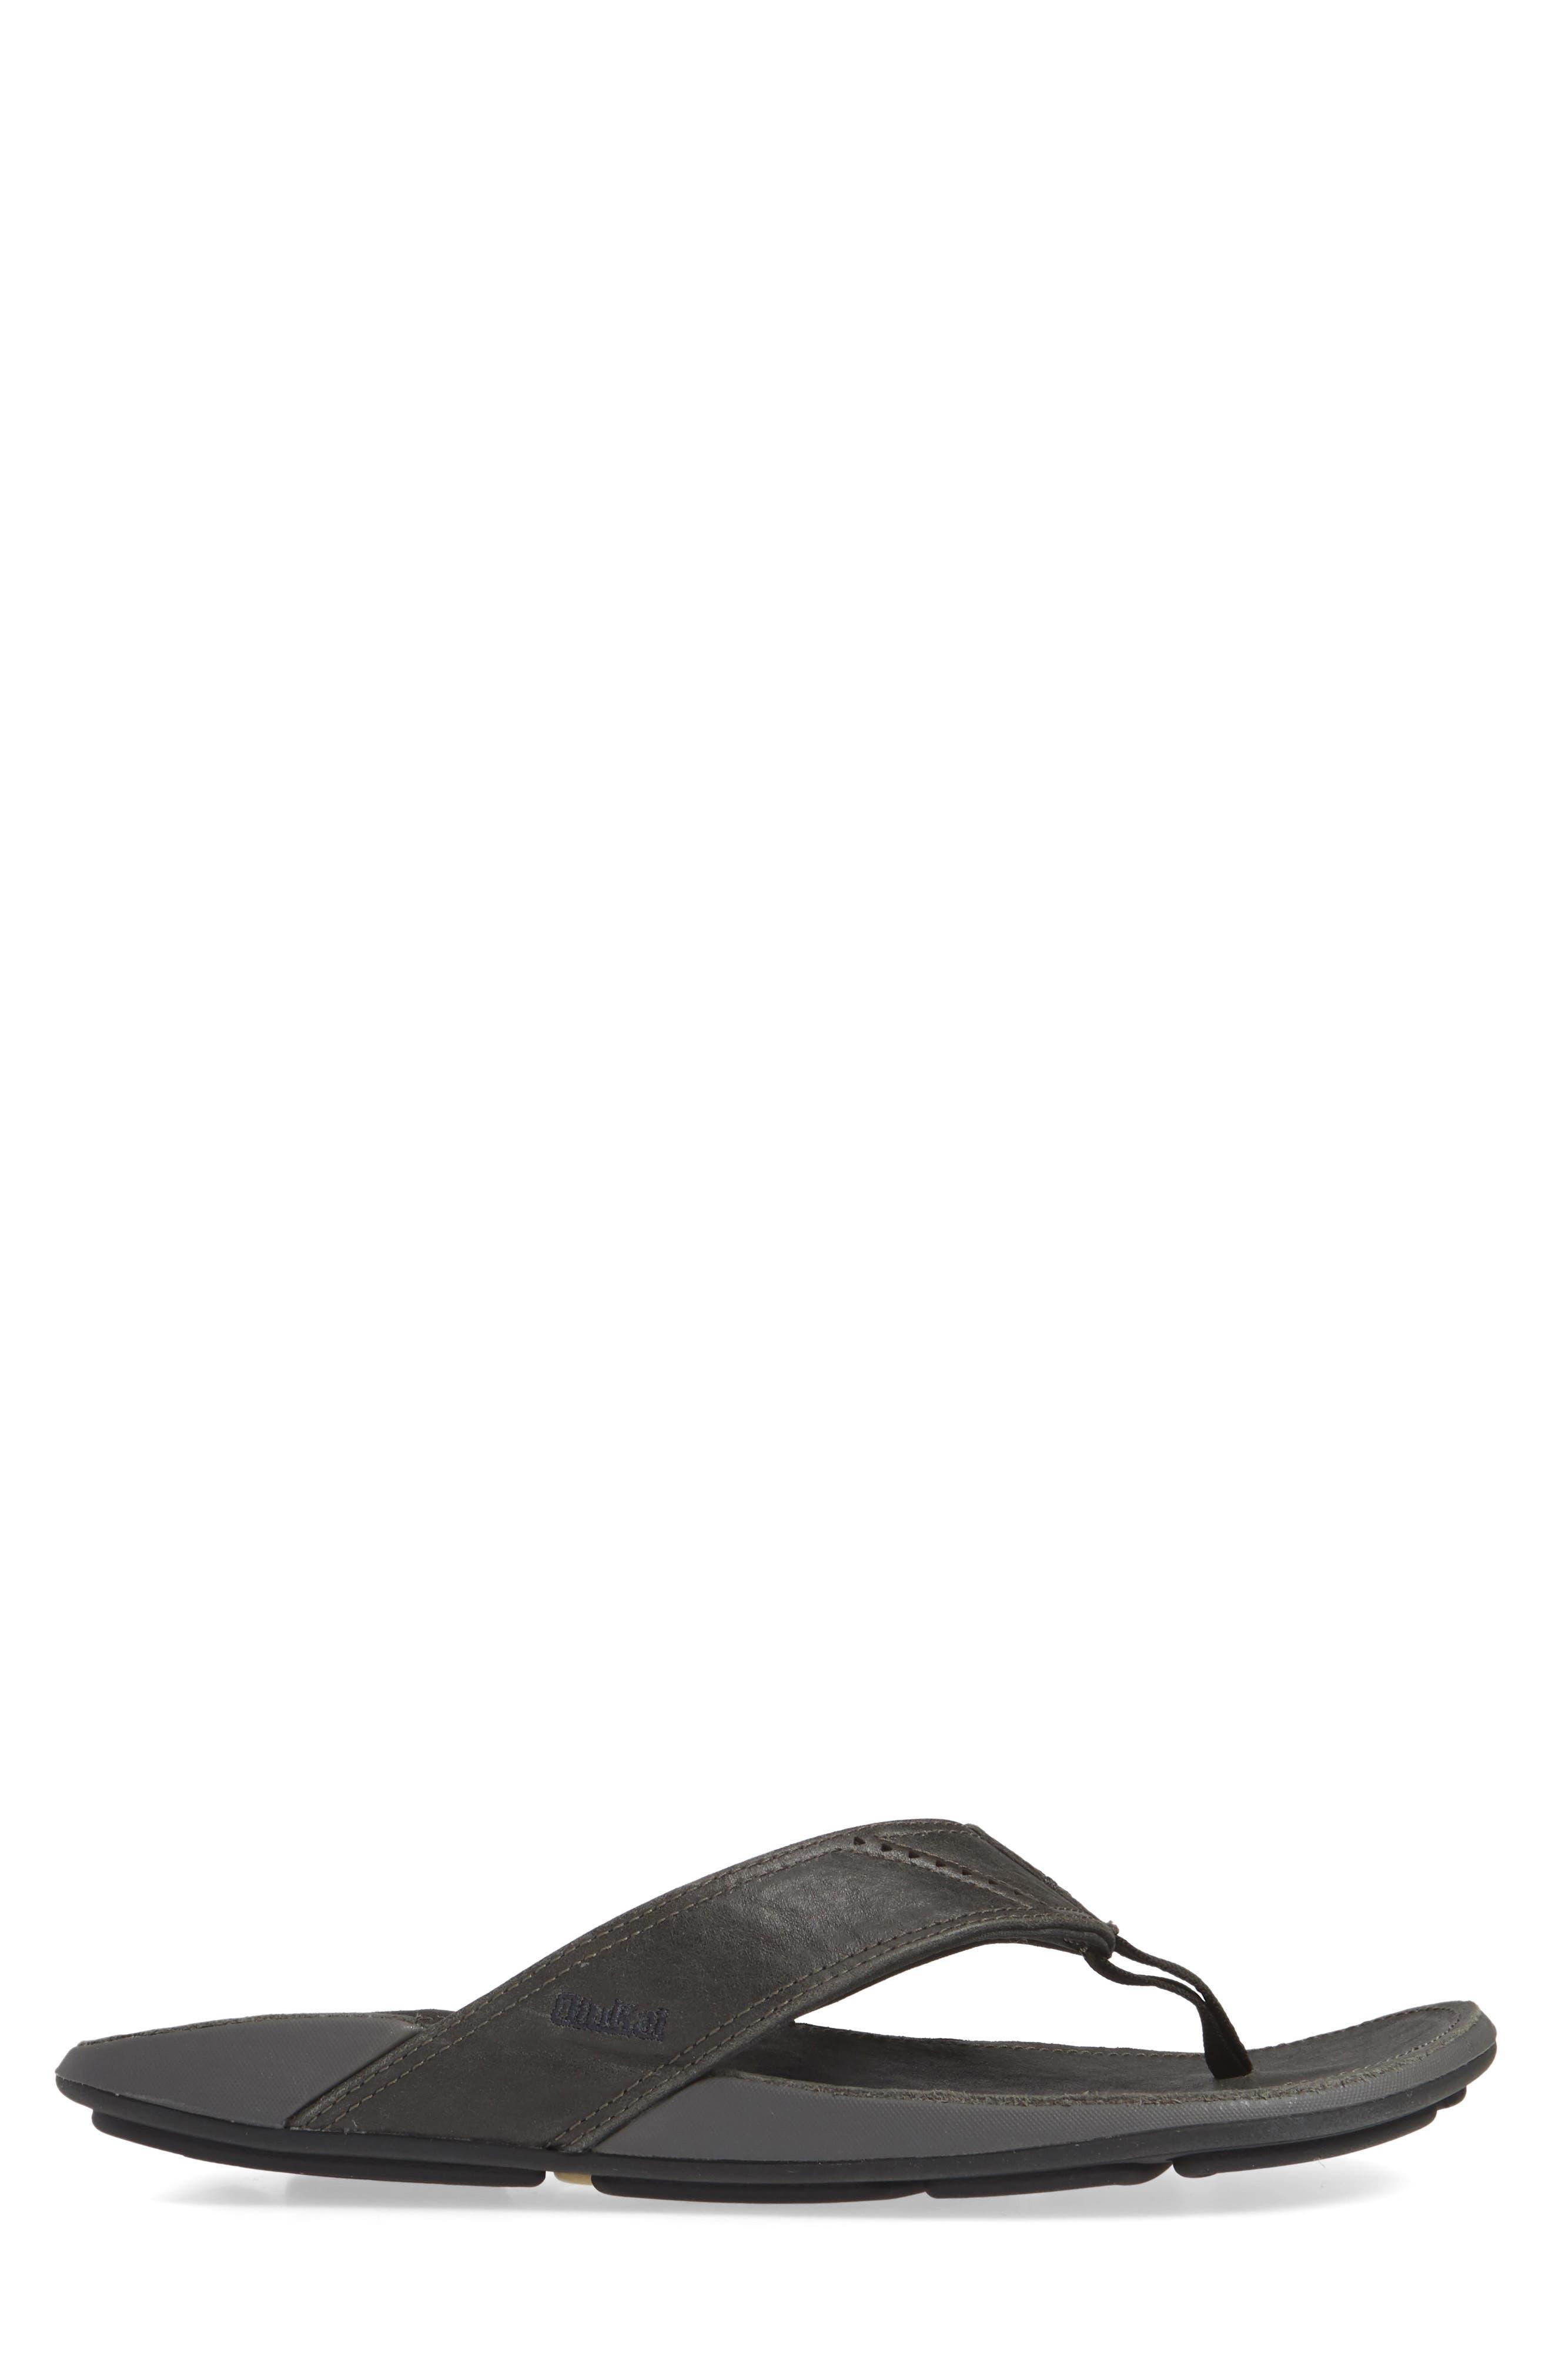 ,                             'Nui' Leather Flip Flop,                             Alternate thumbnail 3, color,                             LAVA ROCK LEATHER